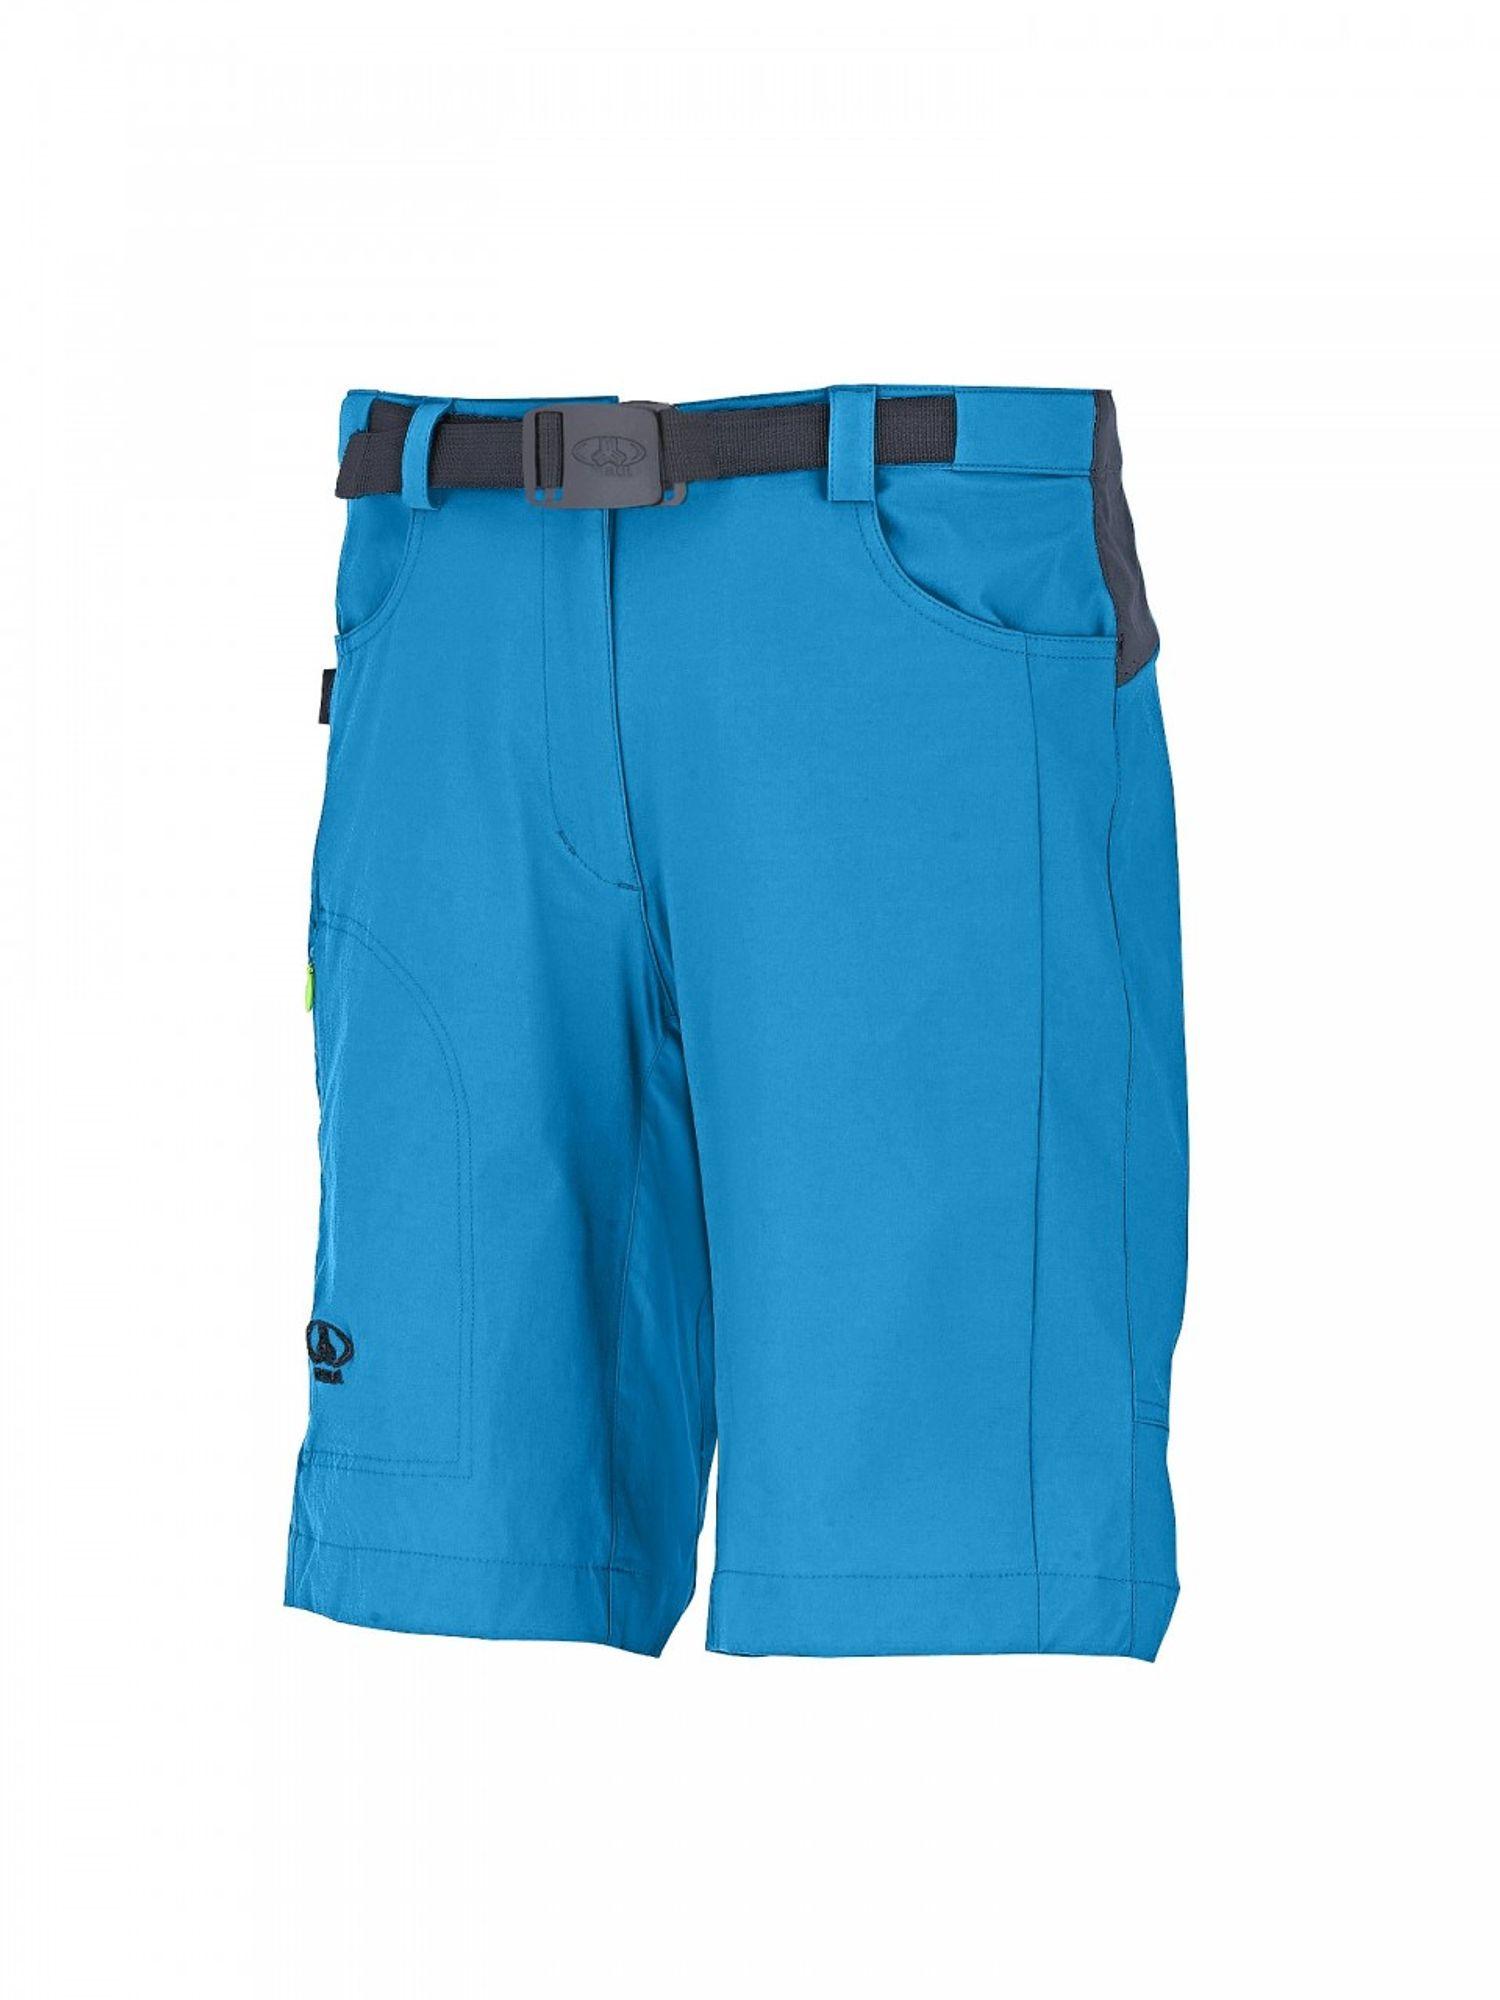 Maul Laval Bermuda Elastic - ocean blue/dark